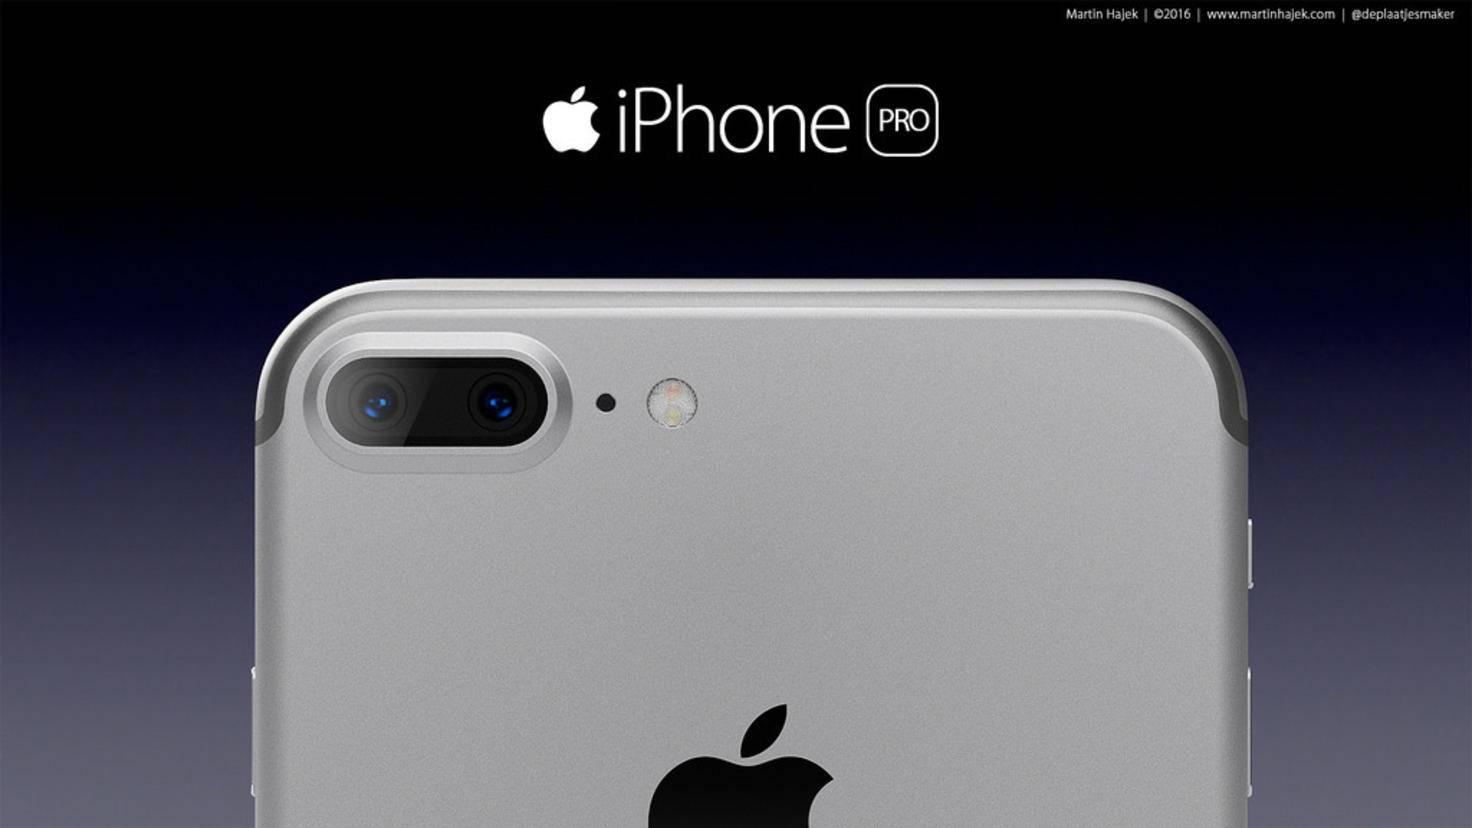 iPhone-Pro-Hajek2